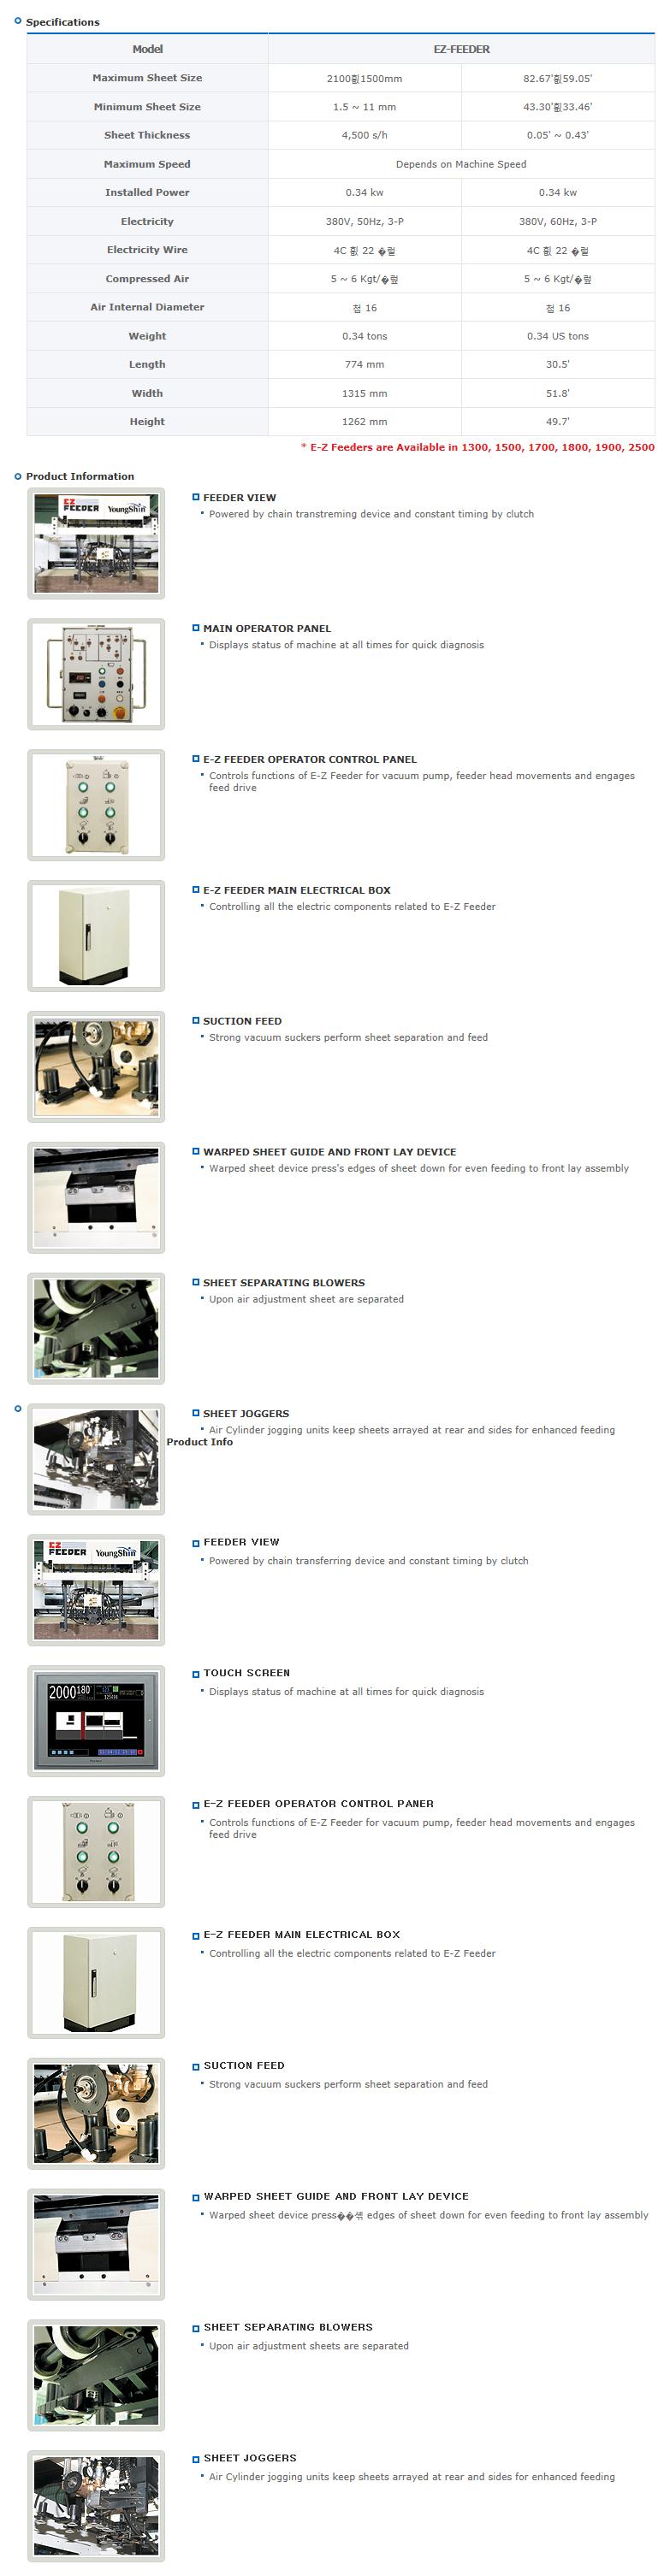 Yougnshin Machinery Semi-automatic EZ-Feeder